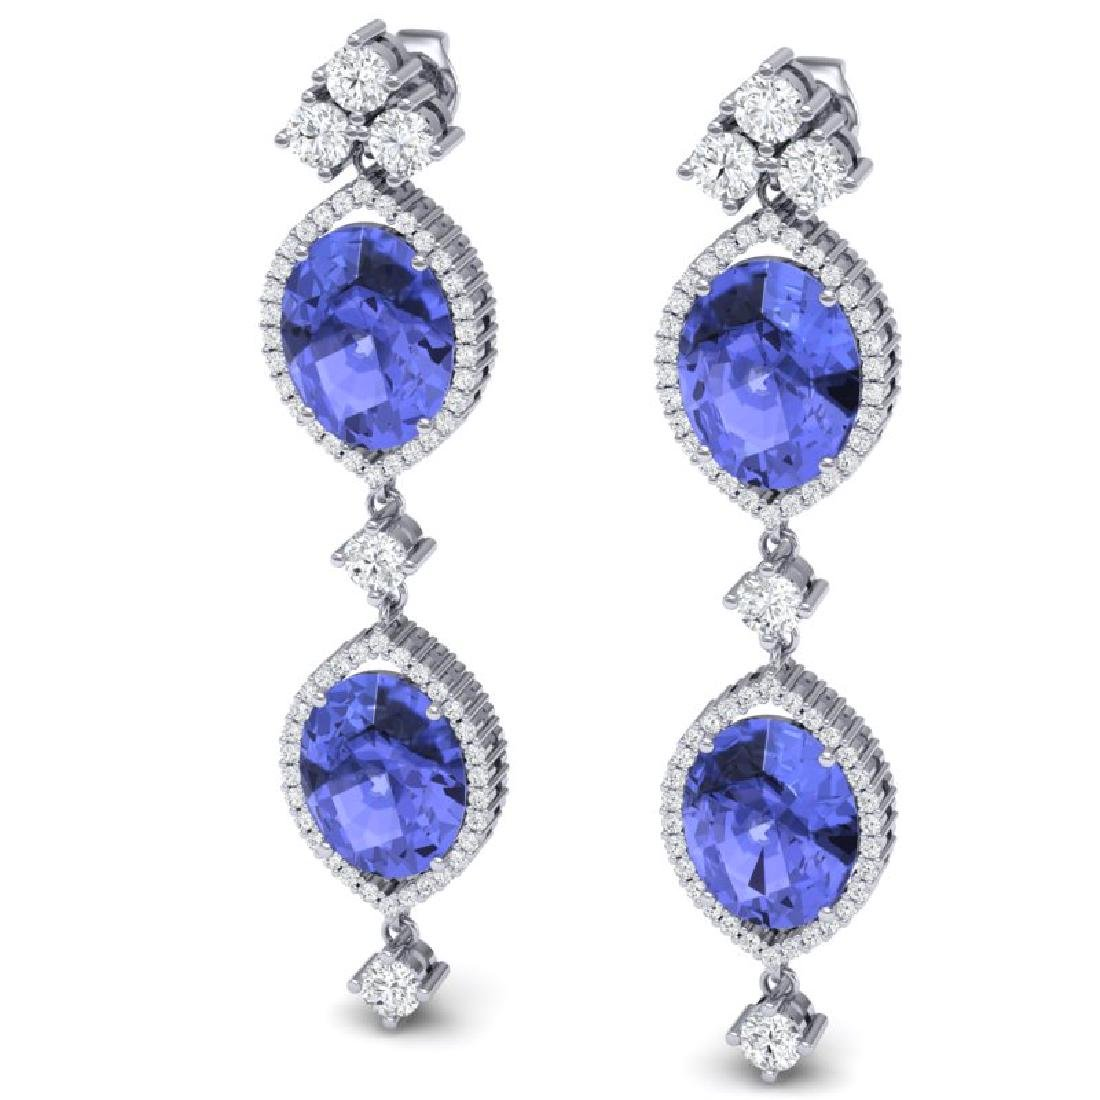 16.21 CTW Royalty Tanzanite & VS Diamond Earrings 18K - 2